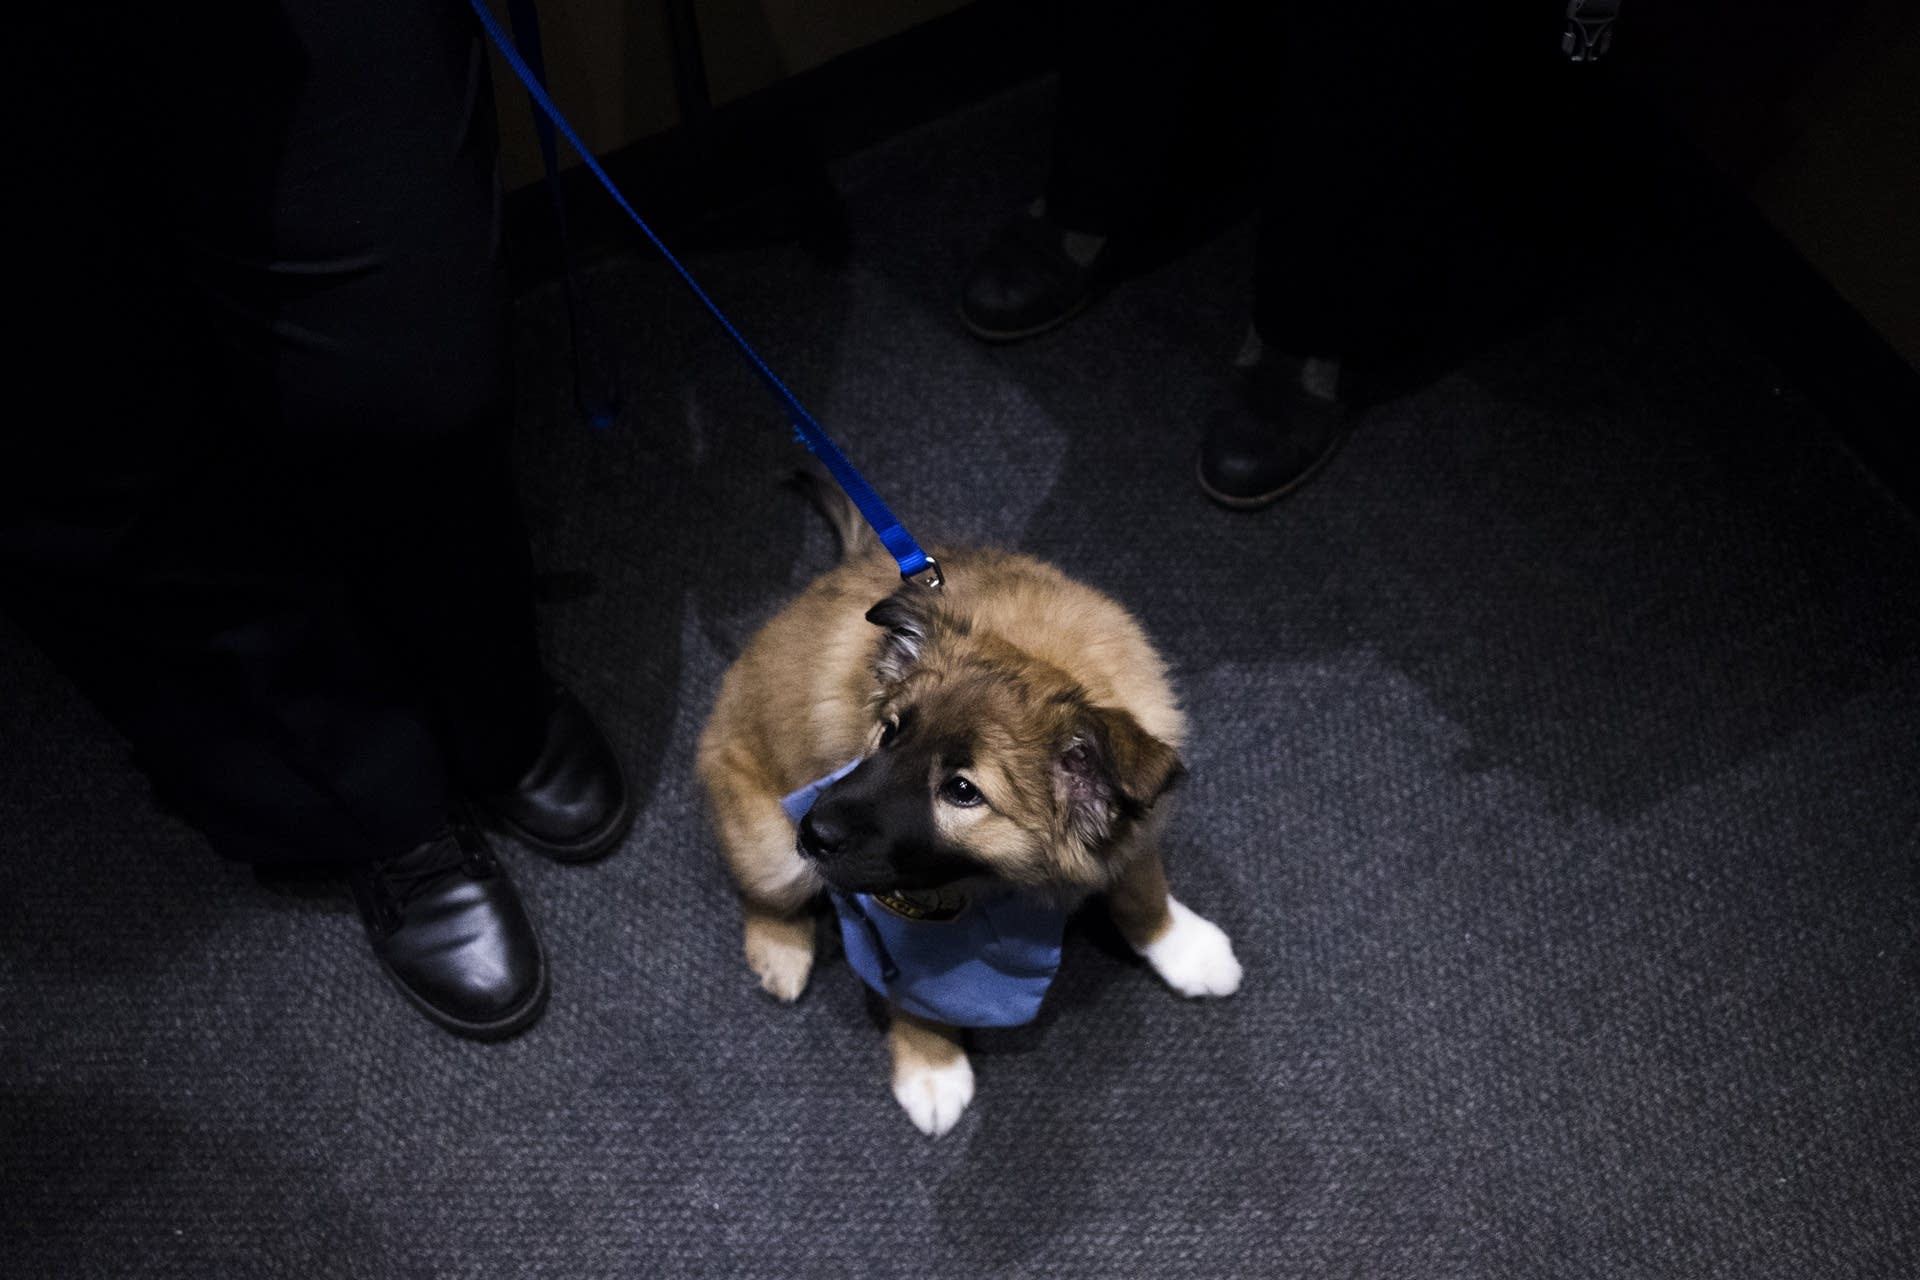 Sergeant Fuzz rides in the elevator.